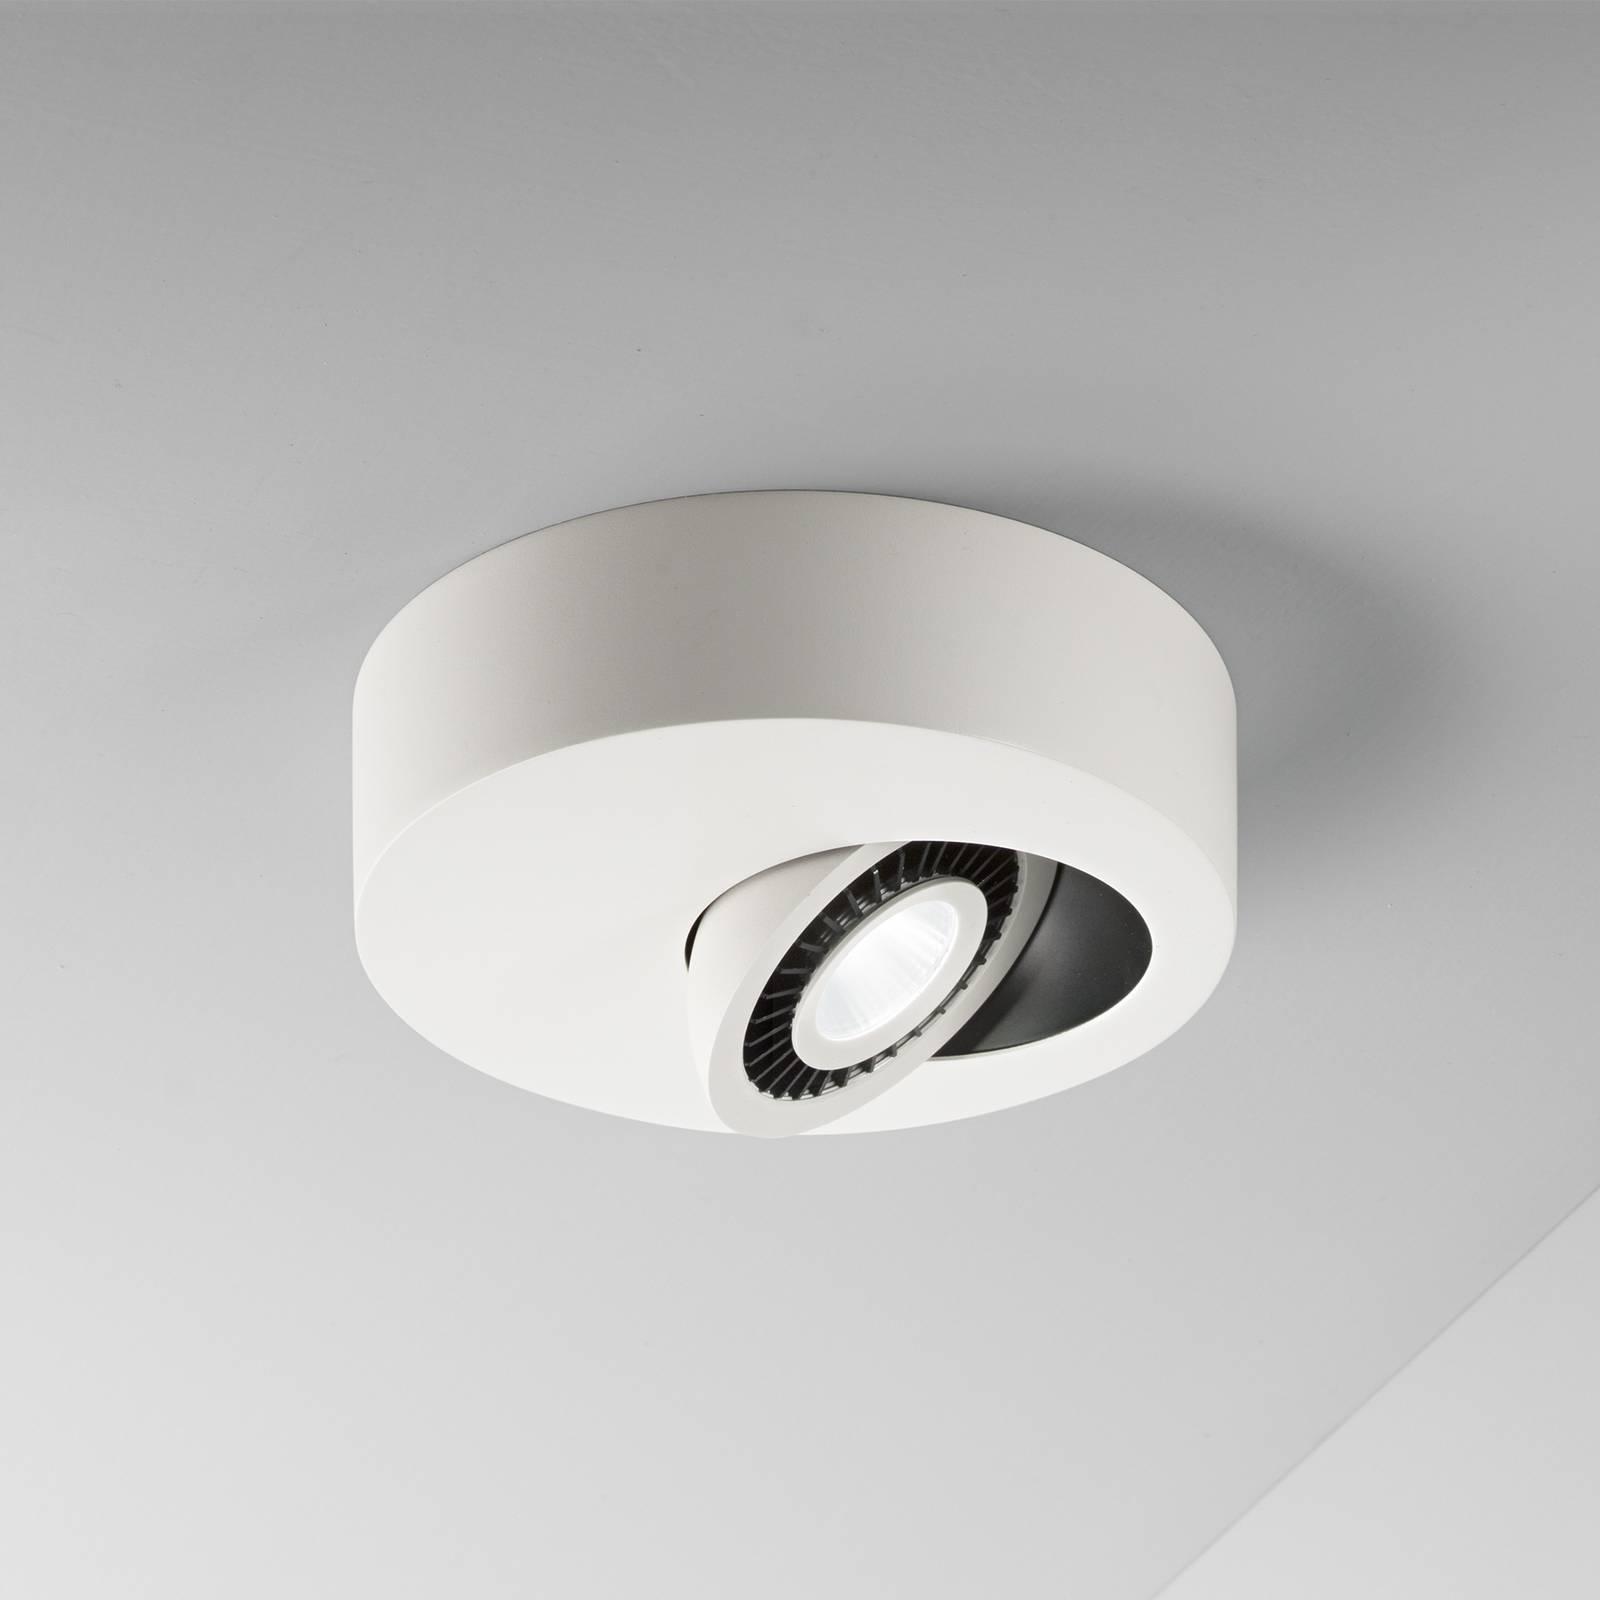 Egger Geo-LED-kattovalaisin LED-spotilla valkoinen